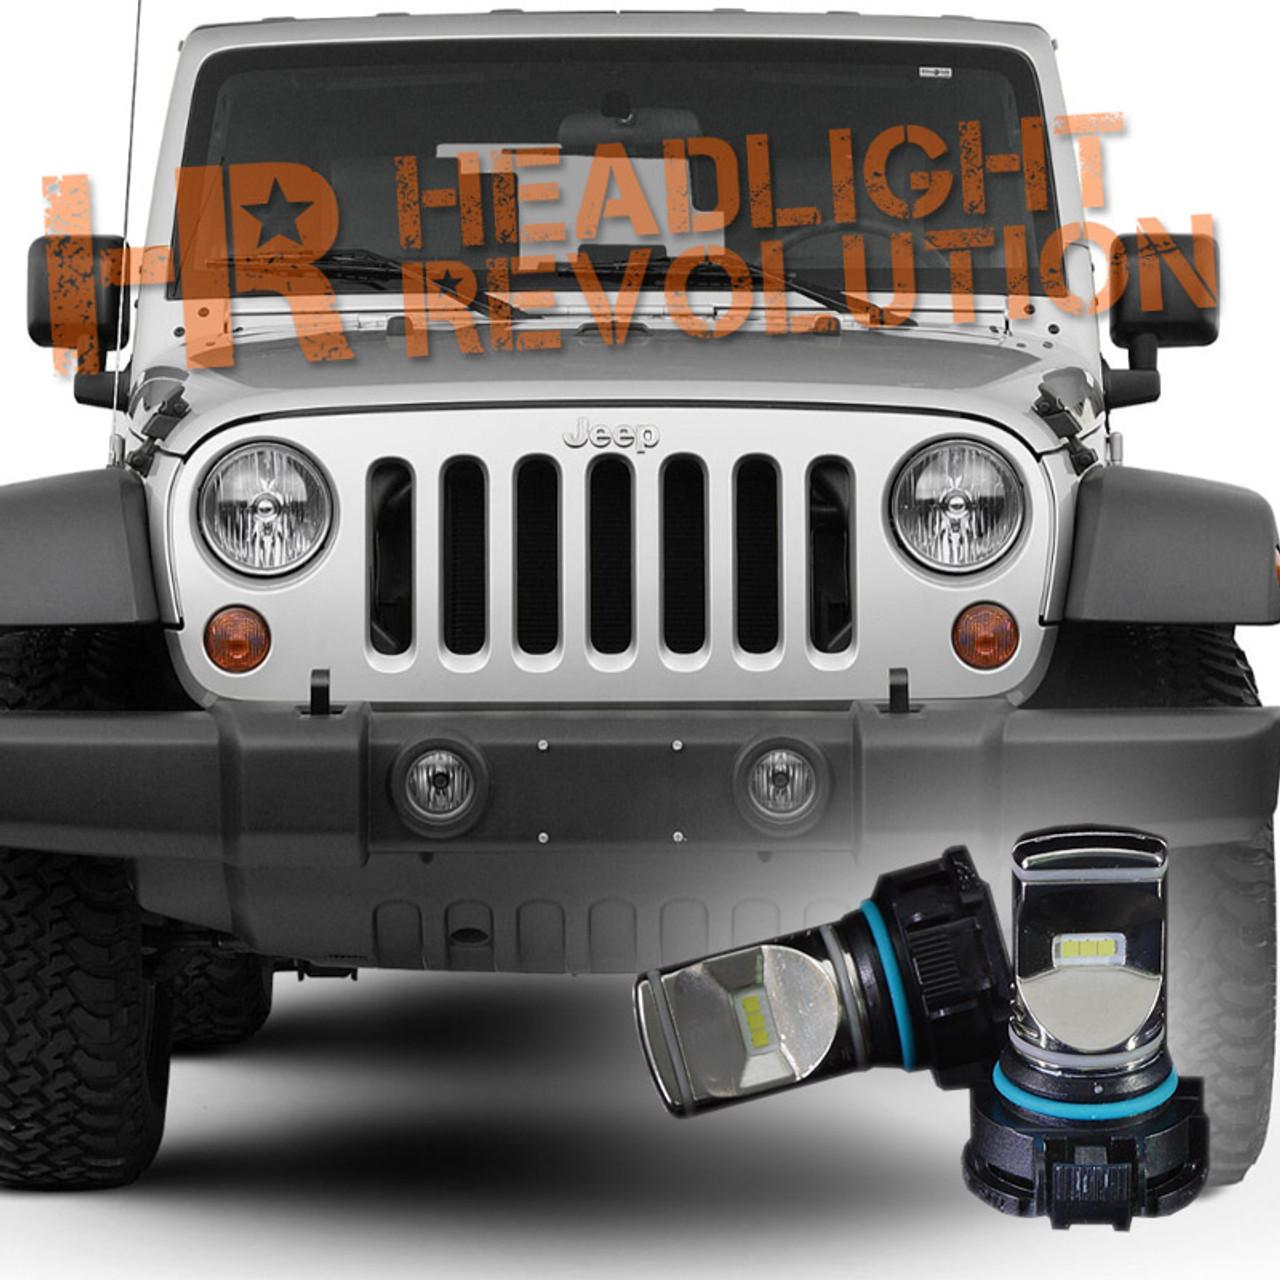 hight resolution of wiring diagram also evo jeep jk front bumper lights on jeep jk fog diagram also evo jeep jk front bumper lights on jeep jk fog light